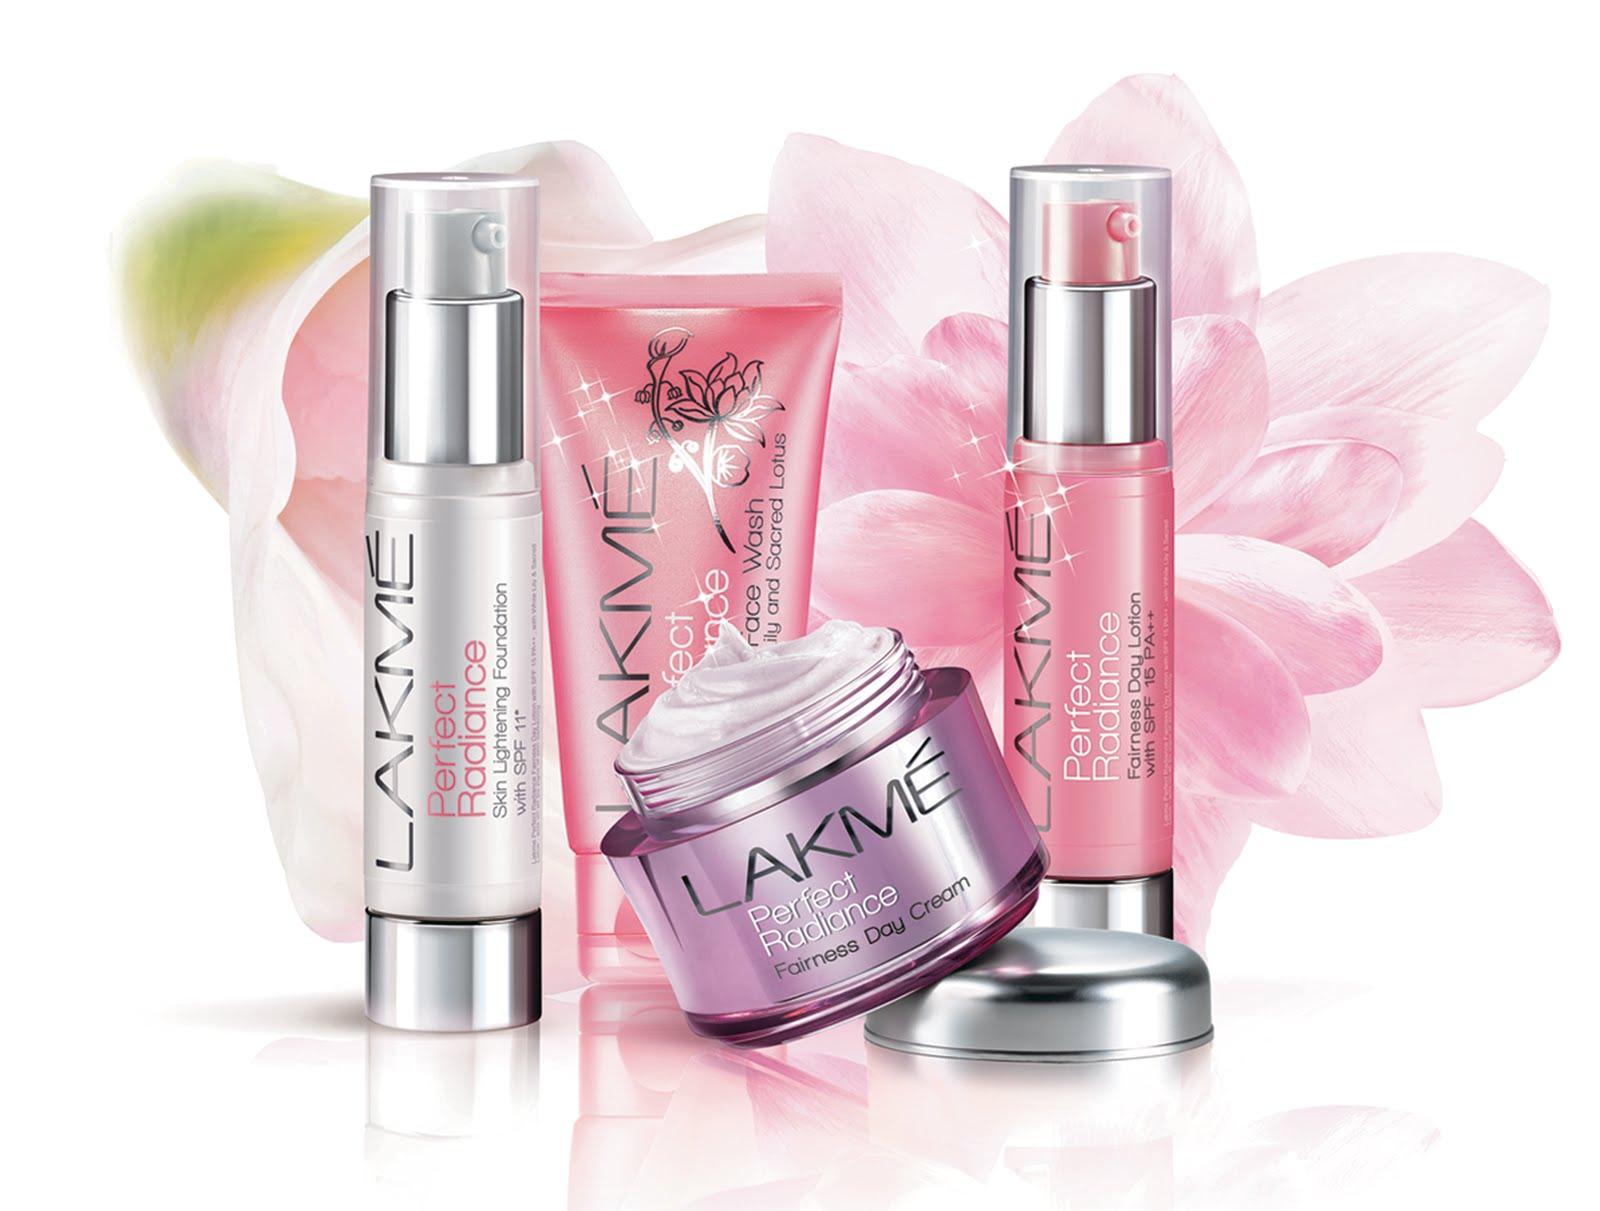 Lakmé Cosmetics - JungleKey.in Image